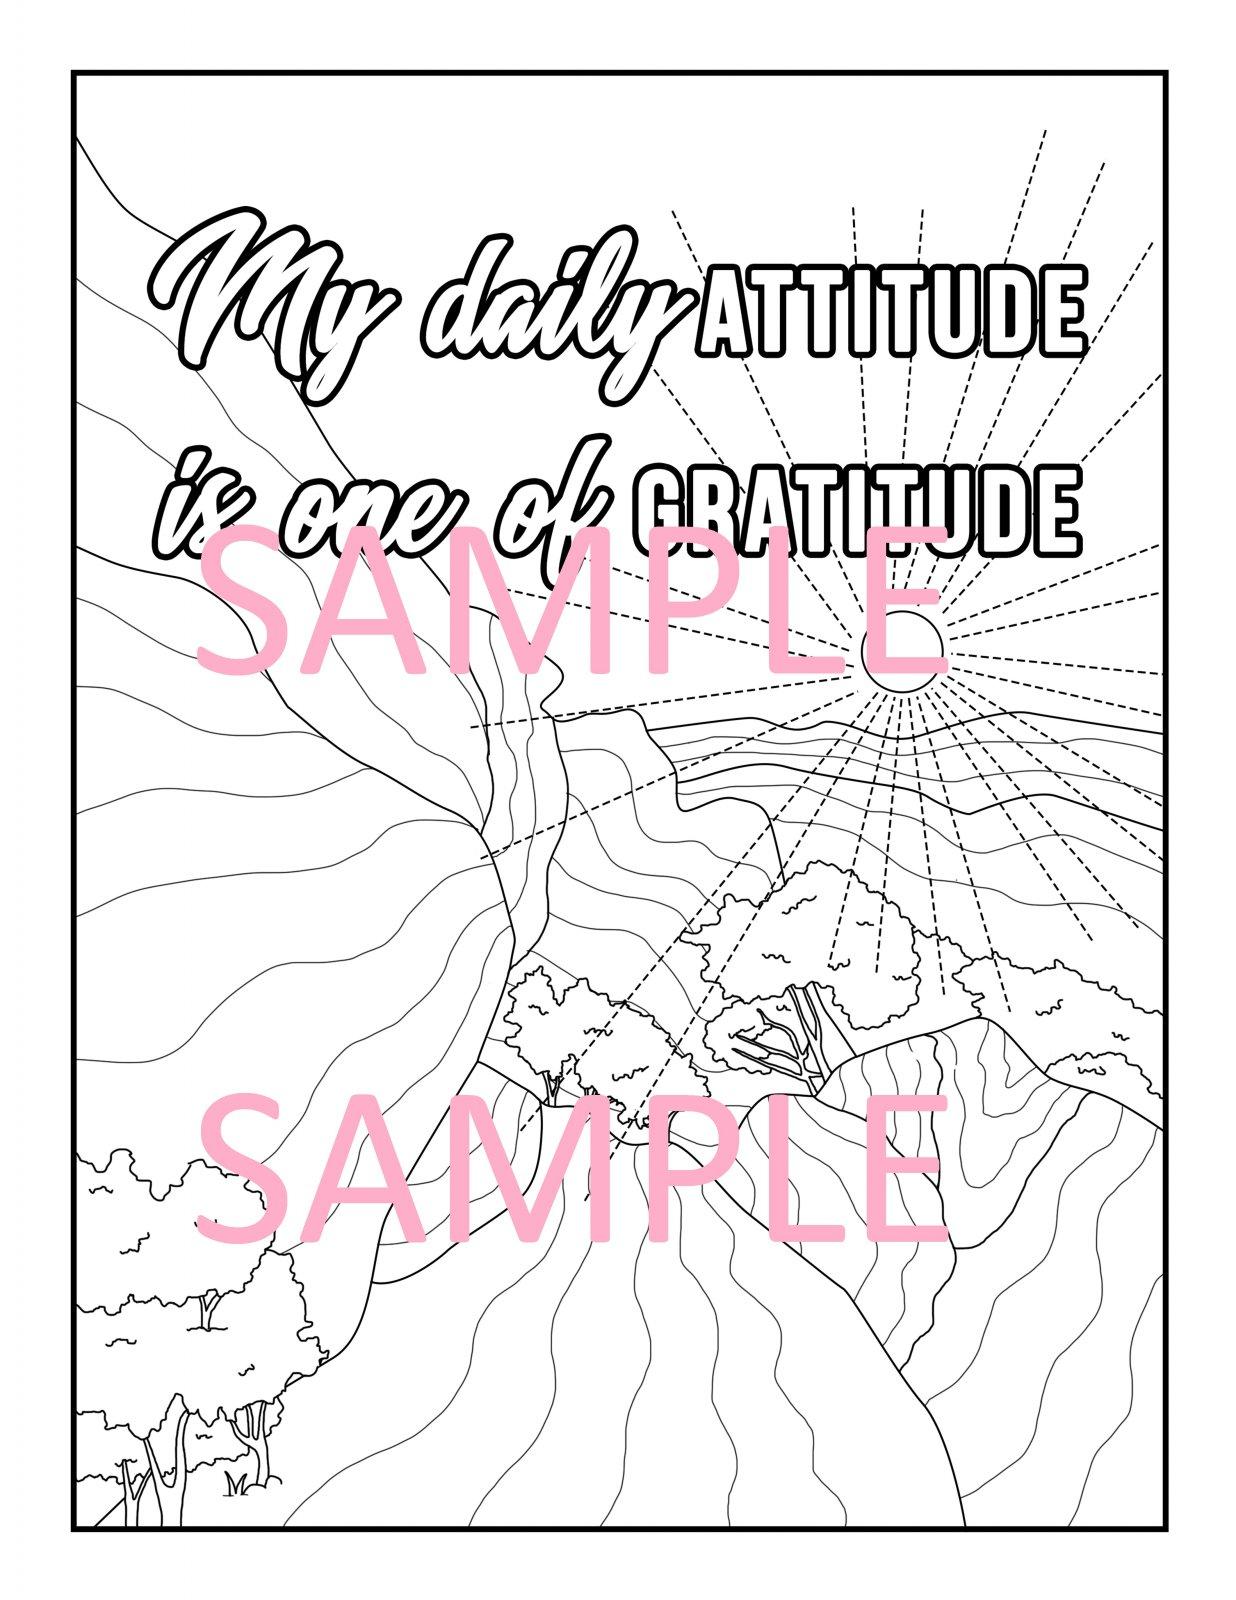 Gratitude Coloring Page 8